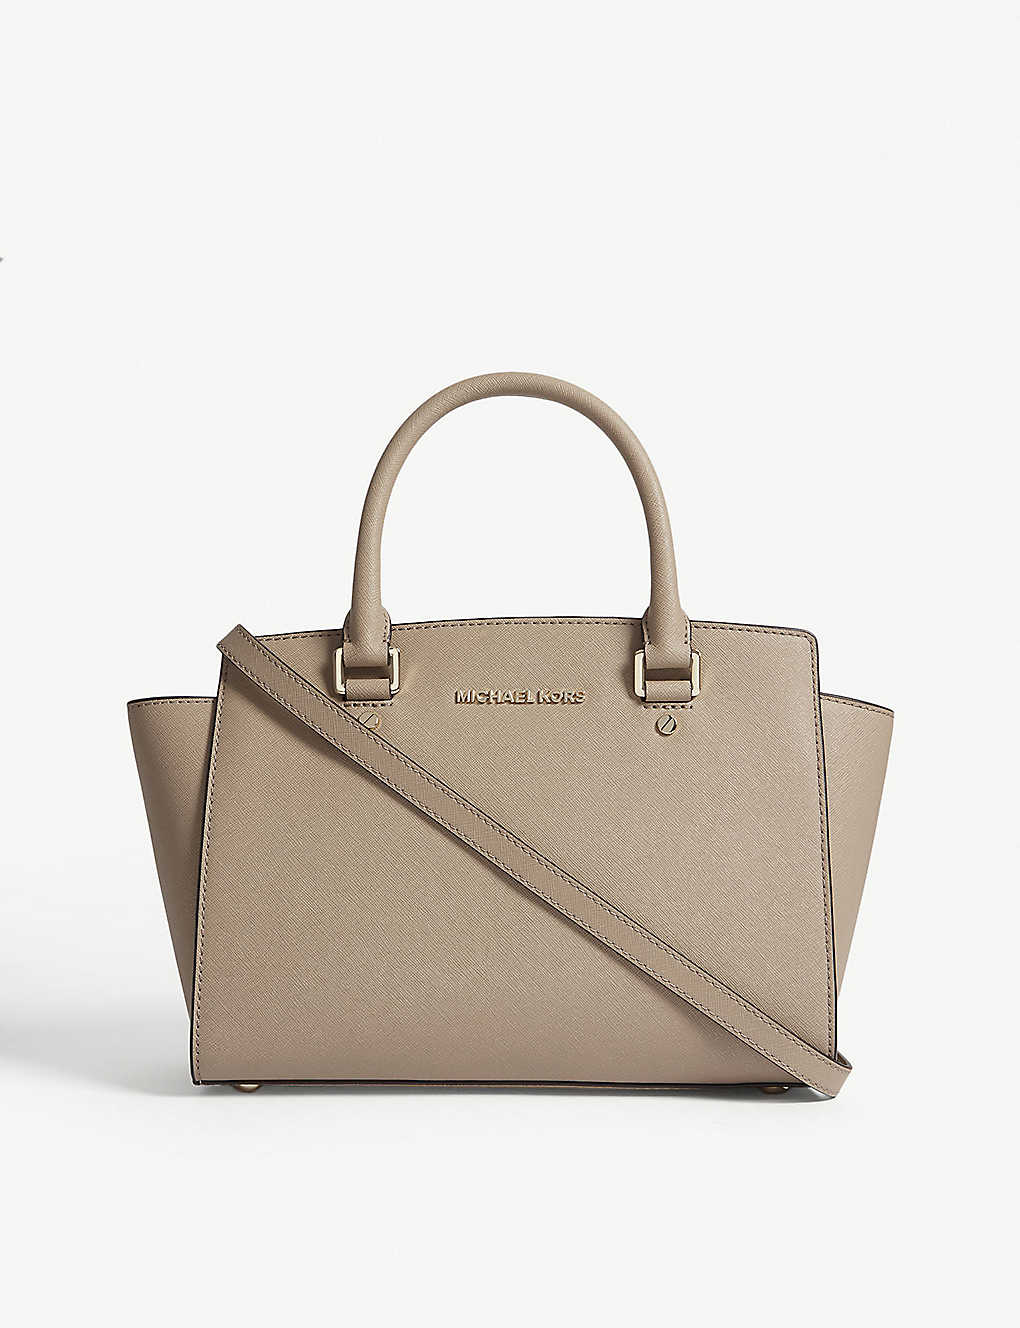 758cd4d8d0bb MICHAEL MICHAEL KORS - Selma Saffiano leather tote | Selfridges.com